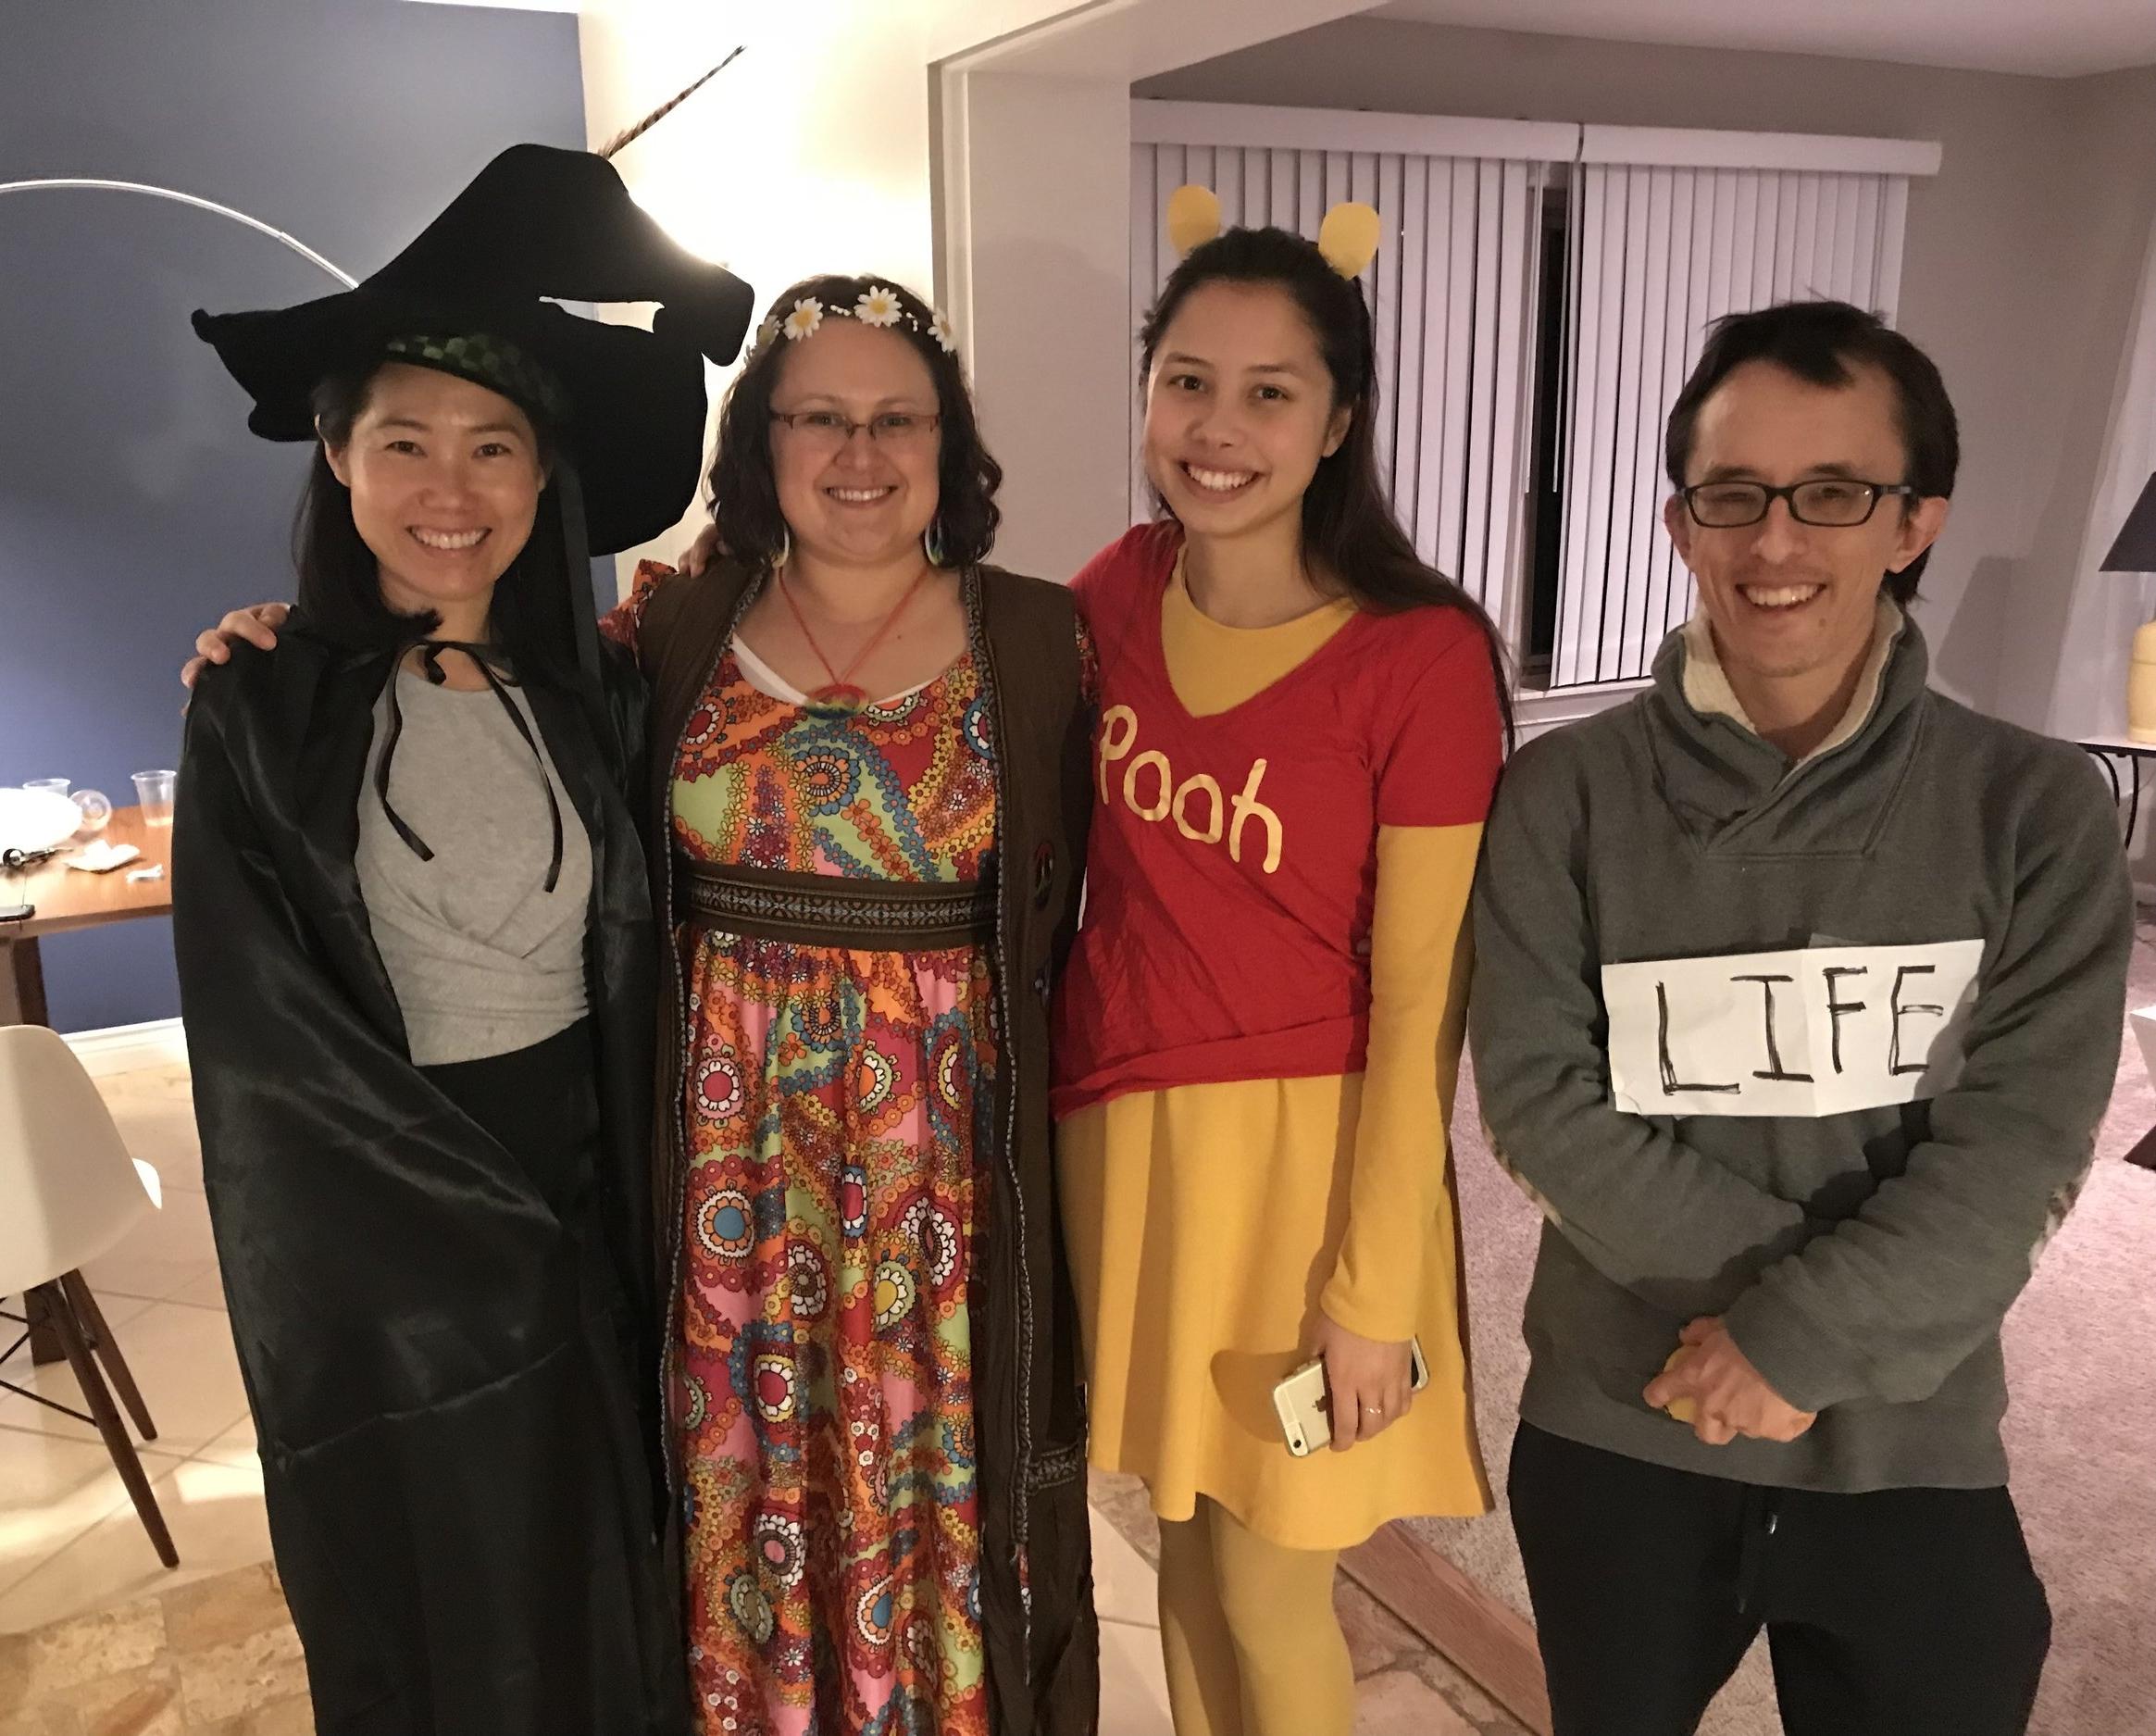 U of M Lab members celebrating Halloween